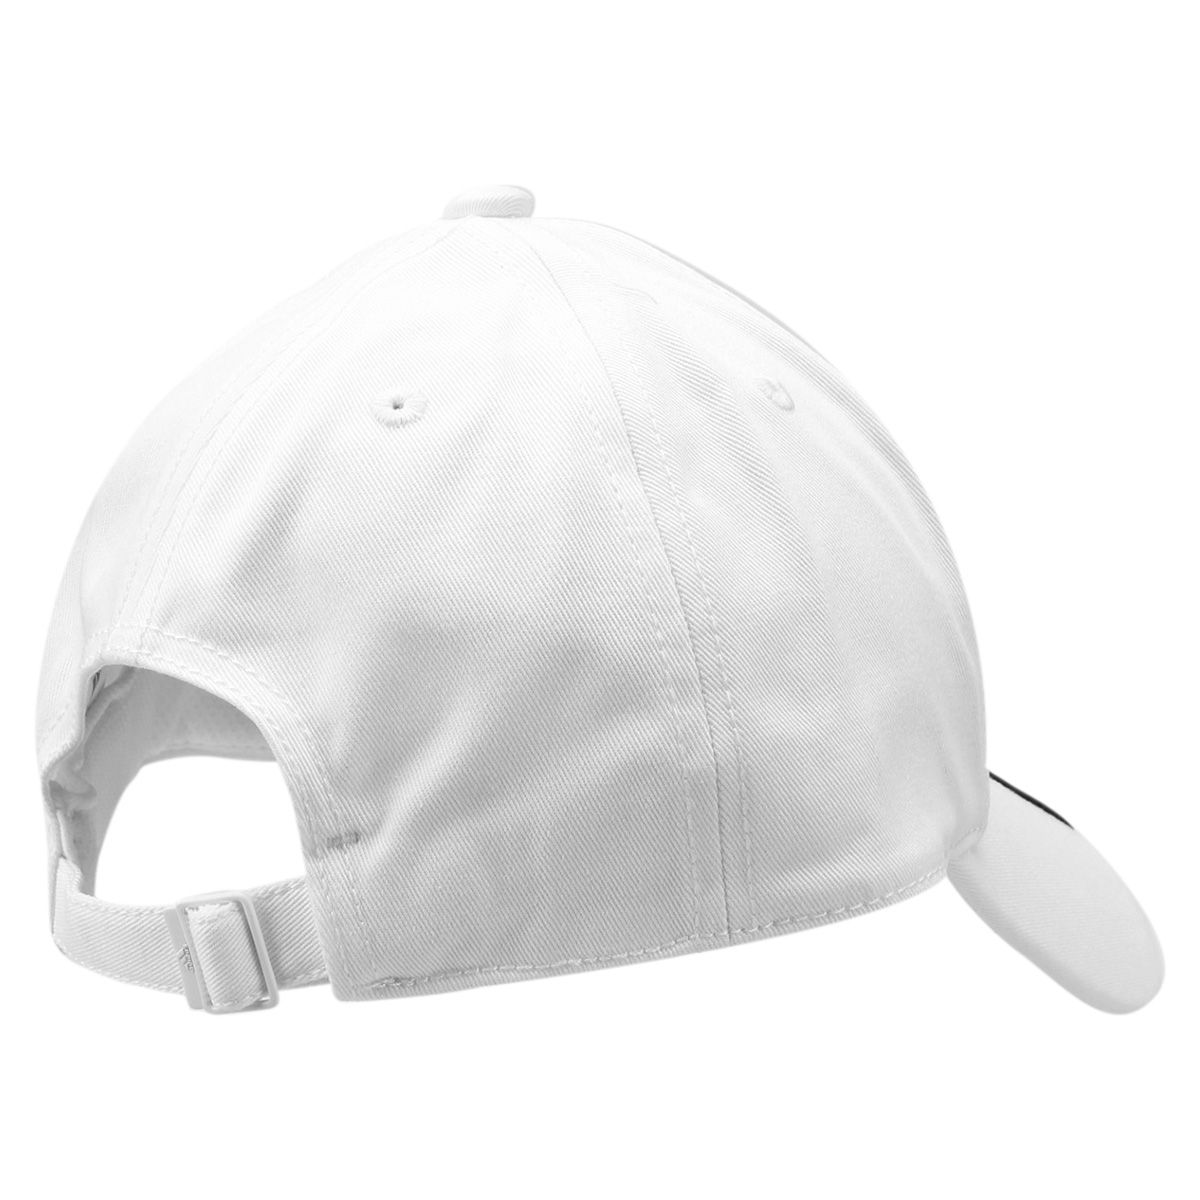 53d56269601aa Boné Adidas Aba Curva Essential 3S Cotton - Compre Agora